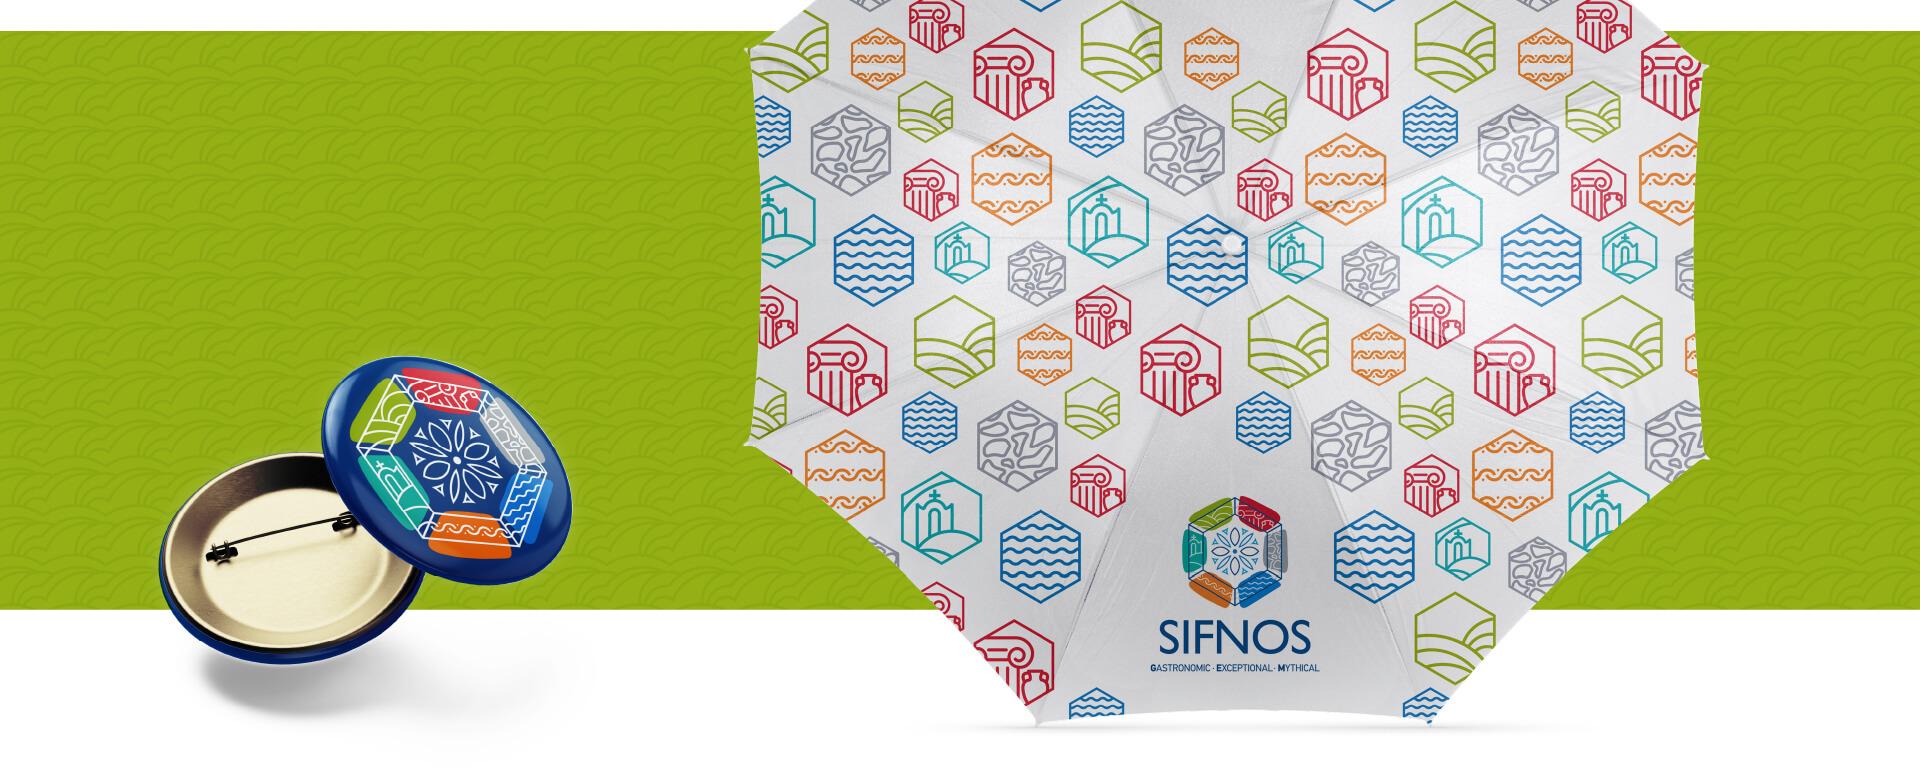 17-Sifnos-Rebranding-2021